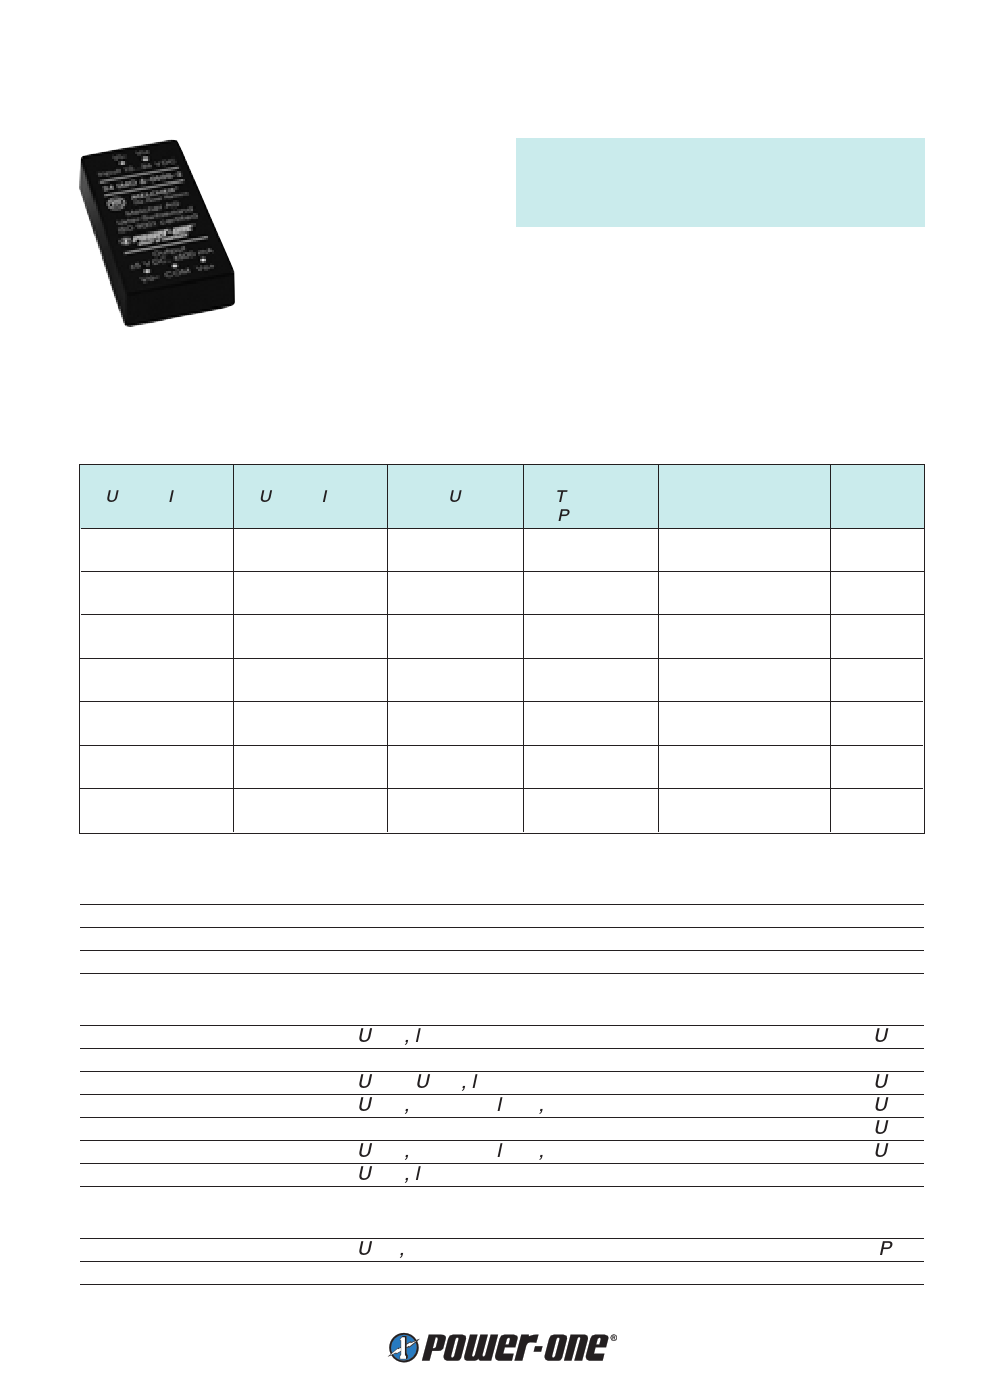 24IMO6-03-2 datasheet